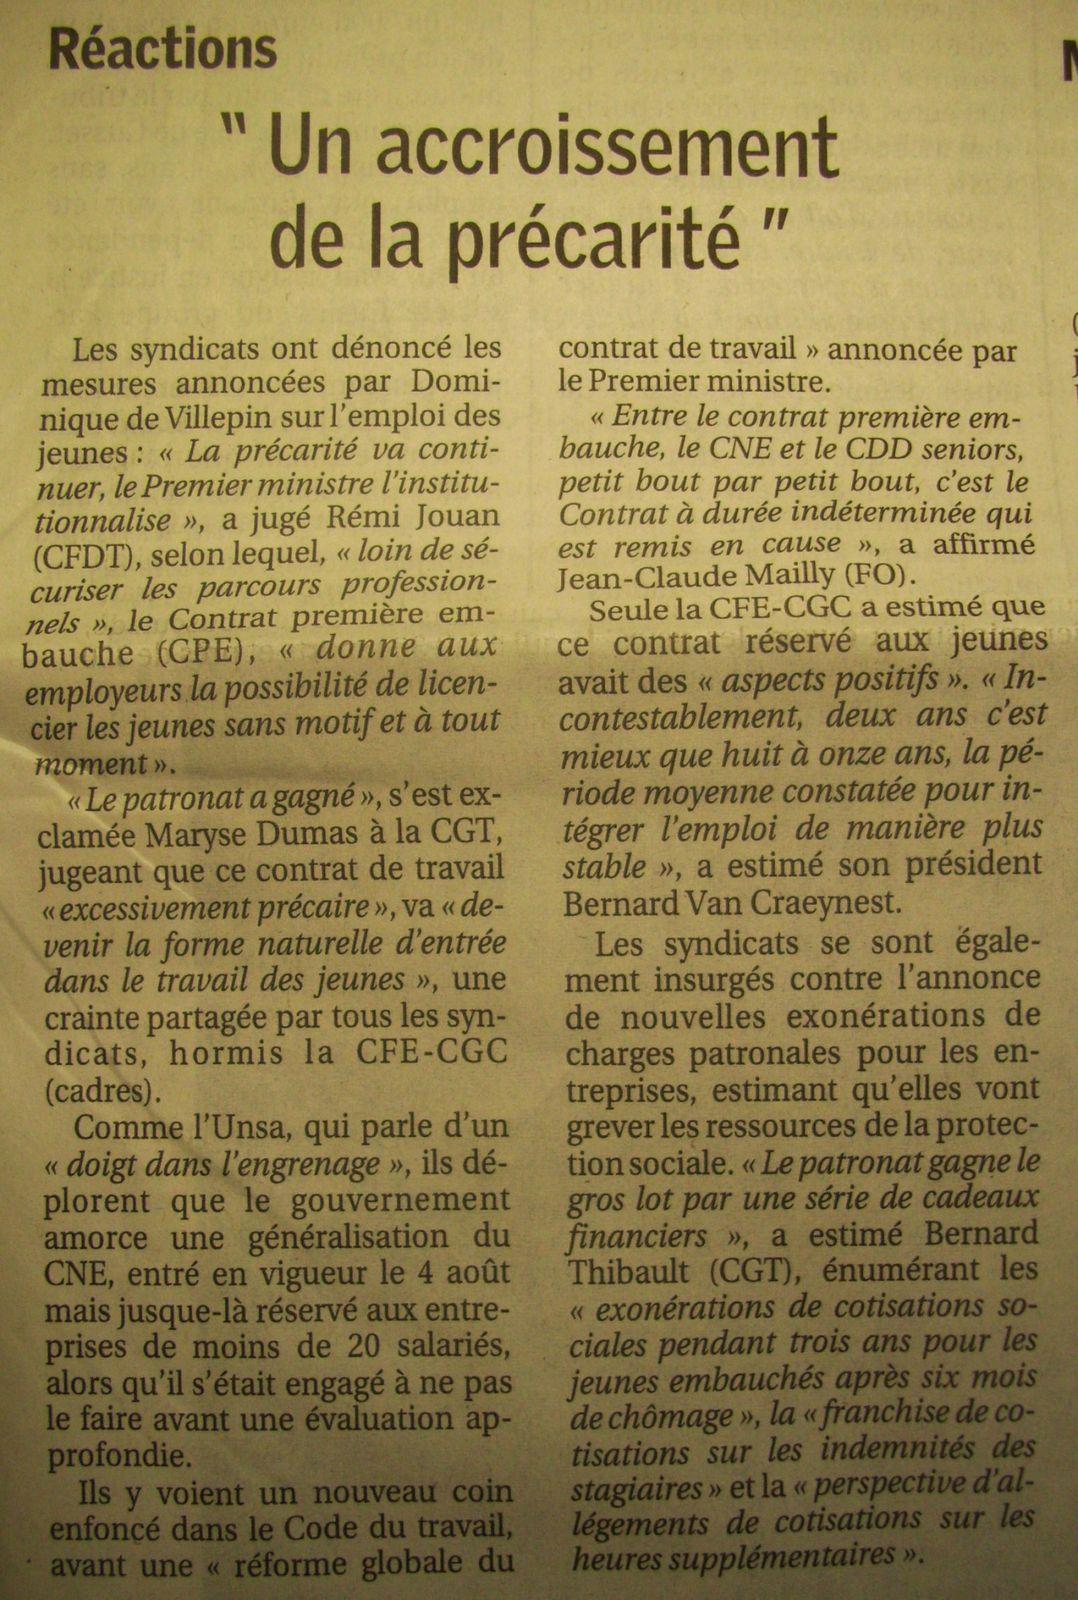 CPE-risque-d-augmenter-precarite.JPG